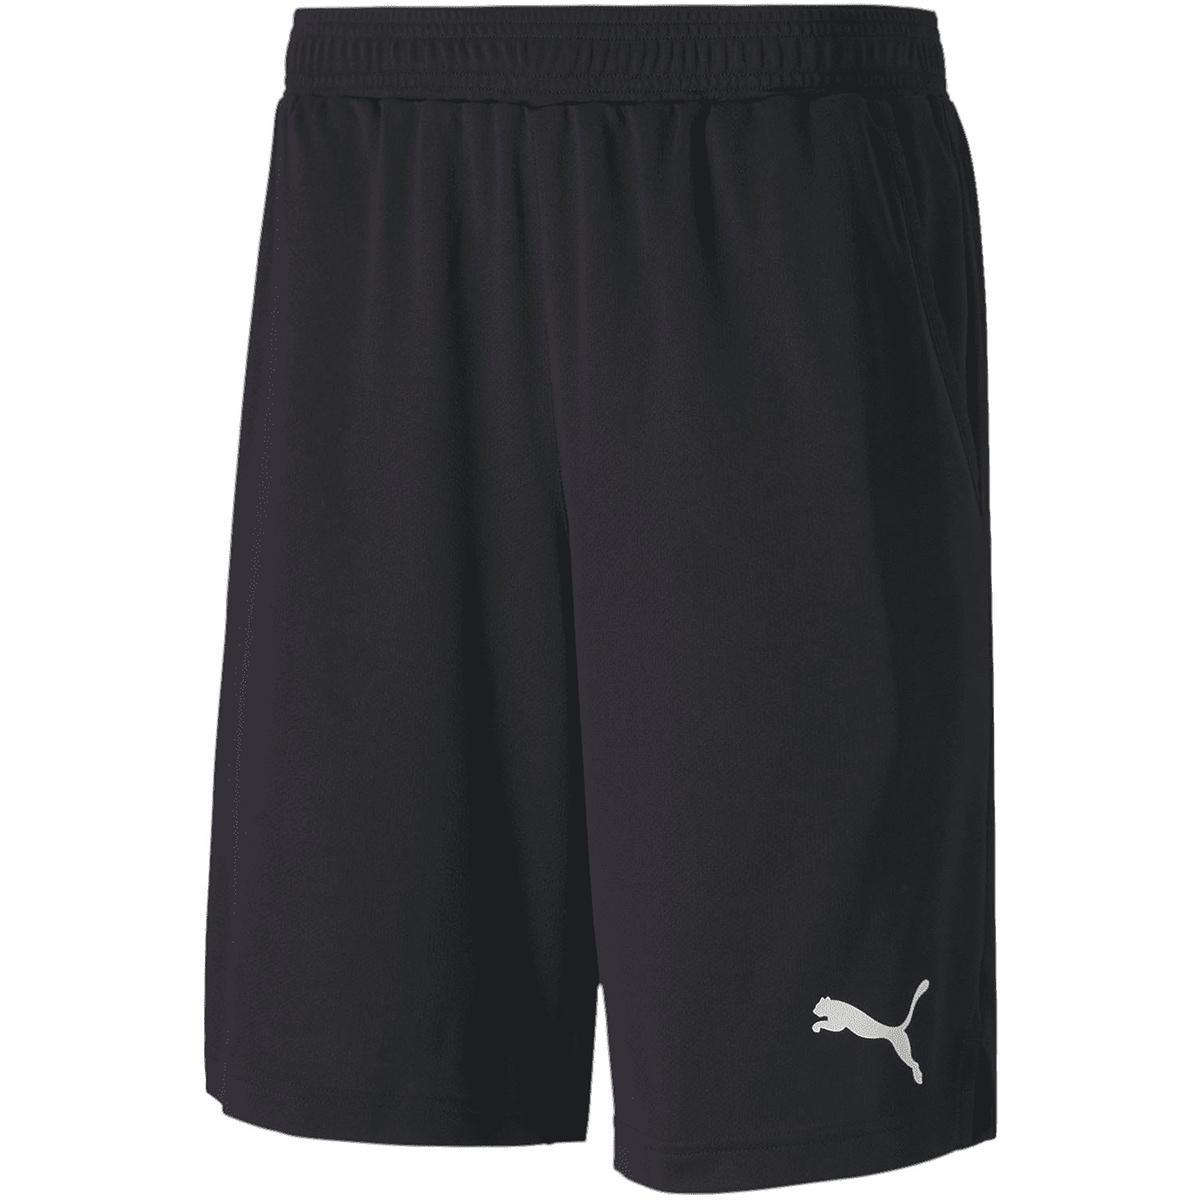 "Puma Men's Rtg Interlock 10"" Shorts - Black, M"